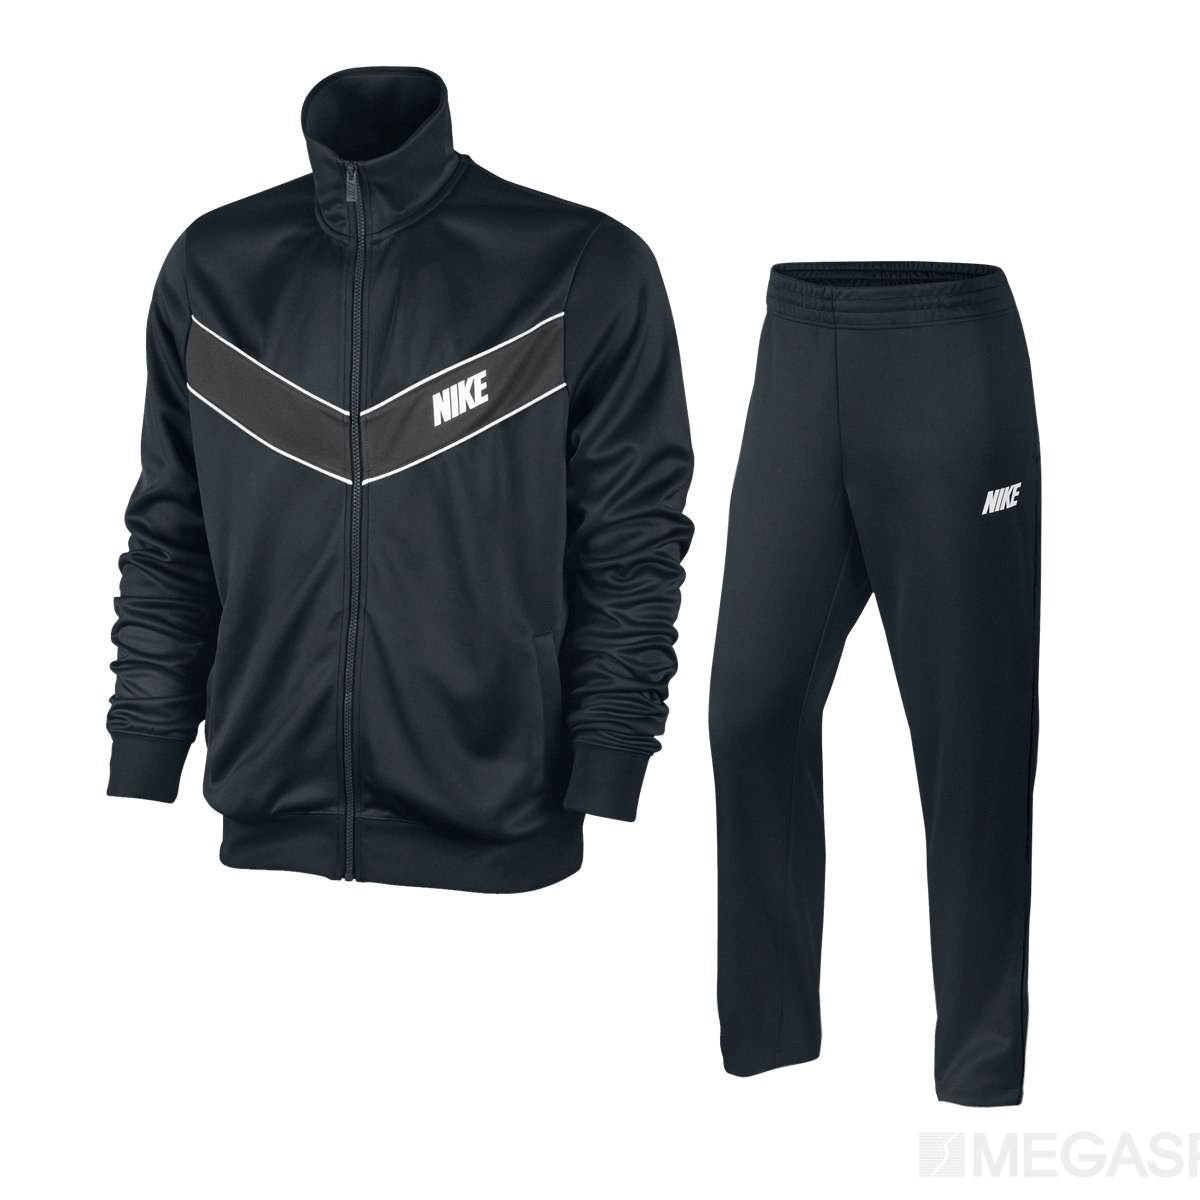 nike striker warmup trainingsanzug sportanzug jogginganzug. Black Bedroom Furniture Sets. Home Design Ideas